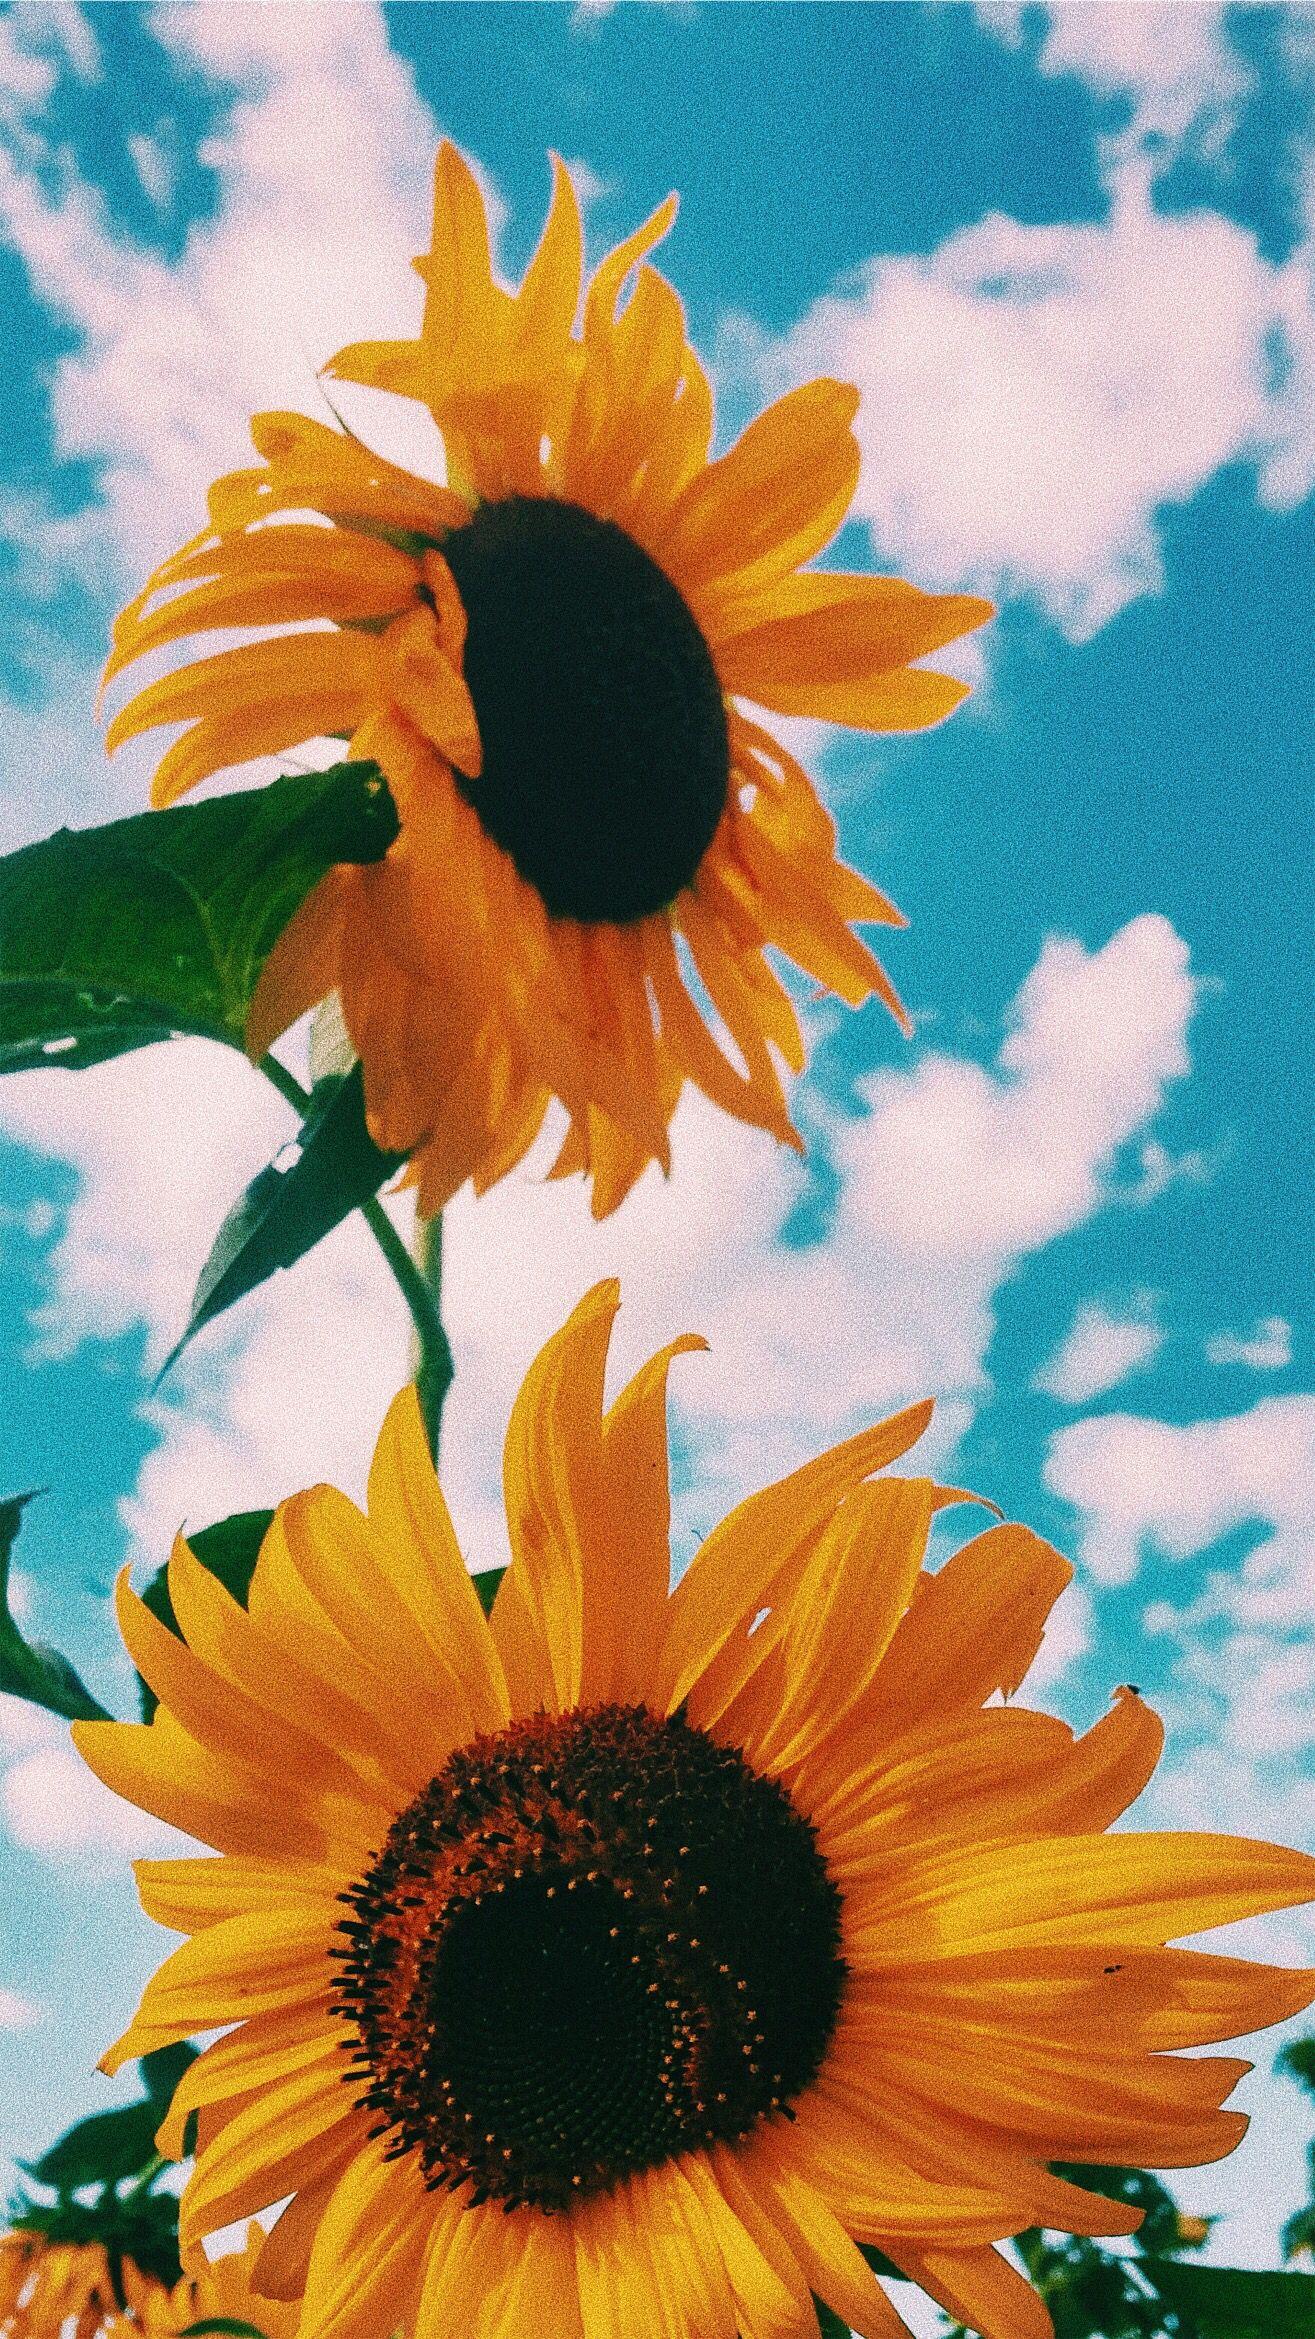 48+ Clouds Sunflower Aesthetic Wallpapers on WallpaperSafari